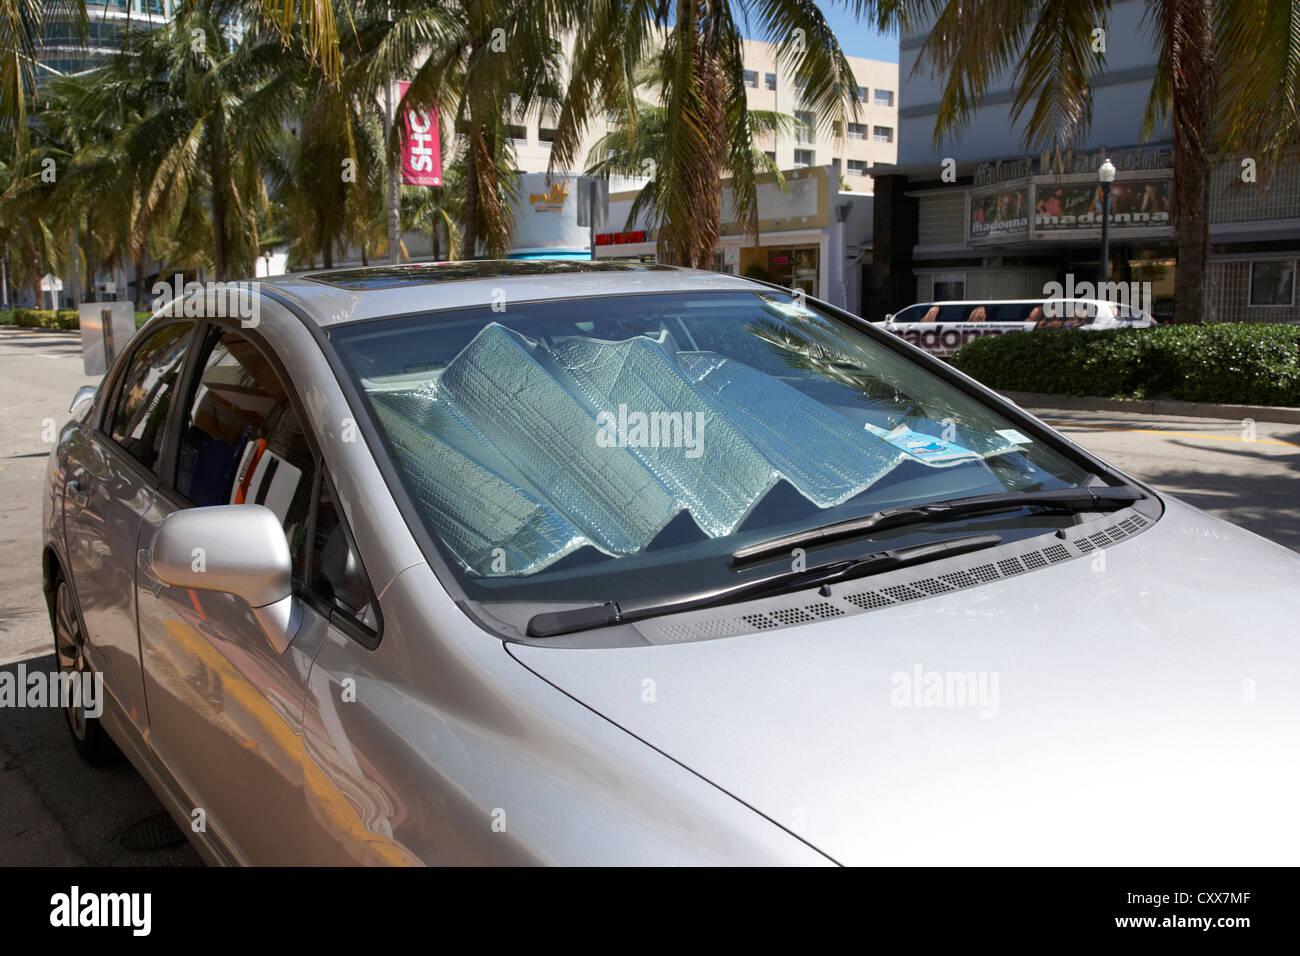 car with windshield sun reflector miami south beach florida usa - Stock Image